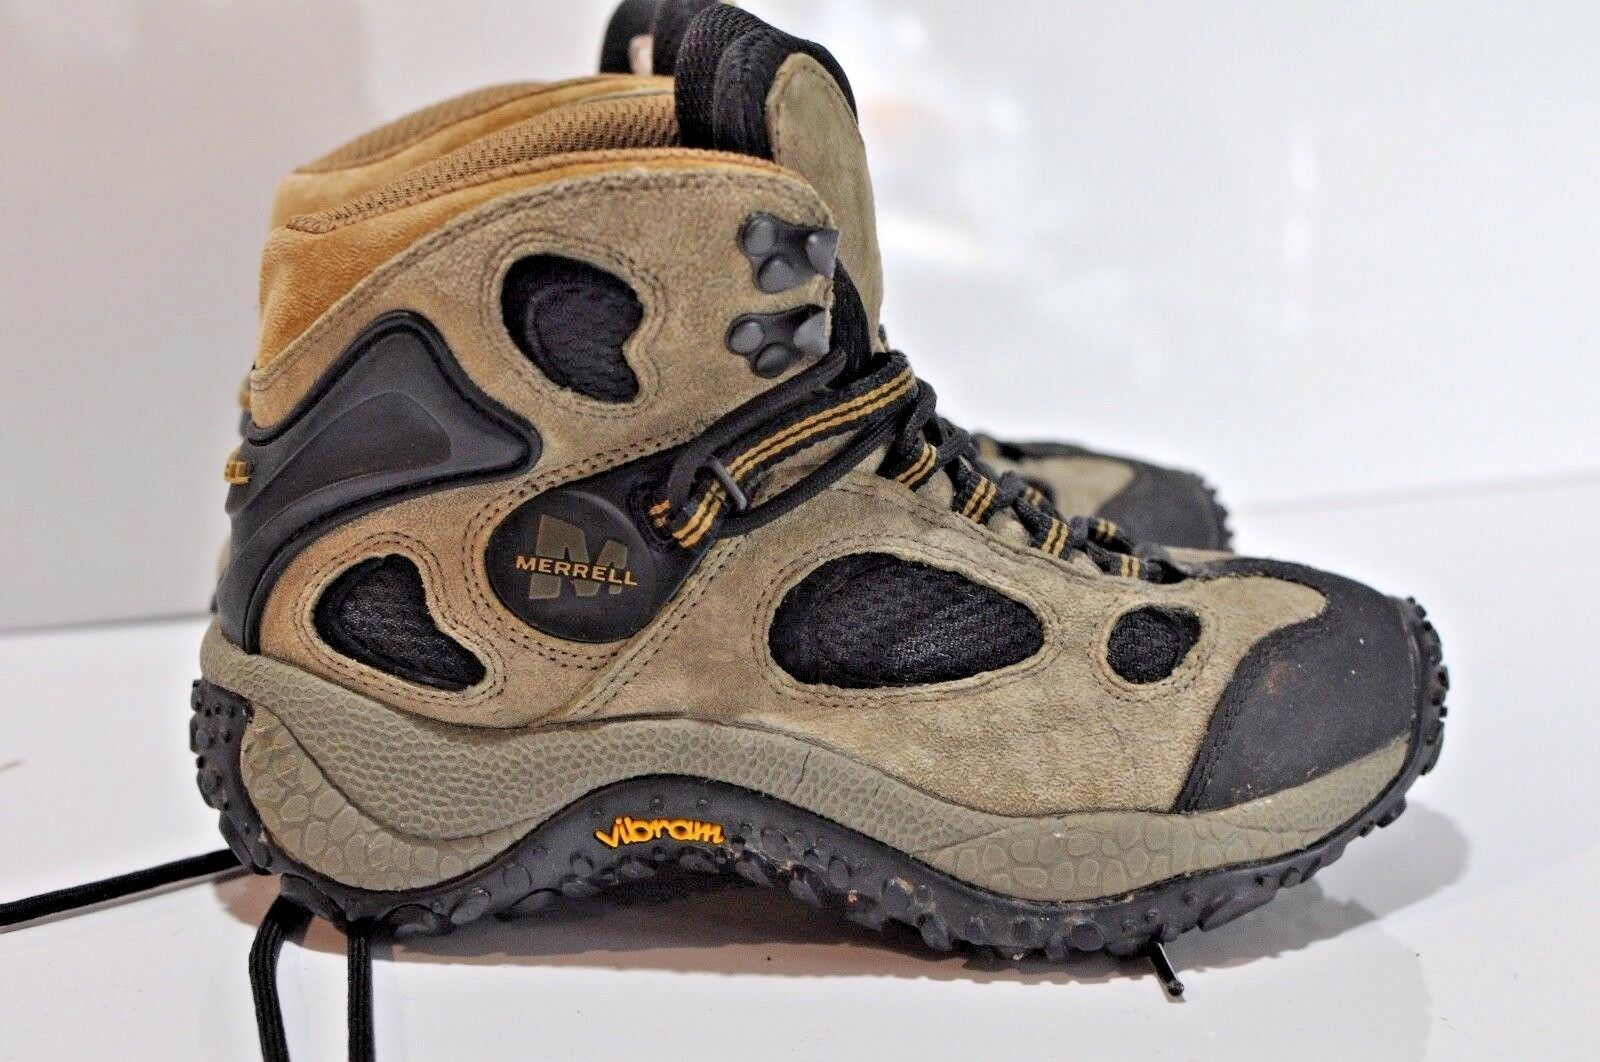 Merrell donna leather Hiking trail trail trail stivali Dimensione 6.5 Vibram soles f65f42